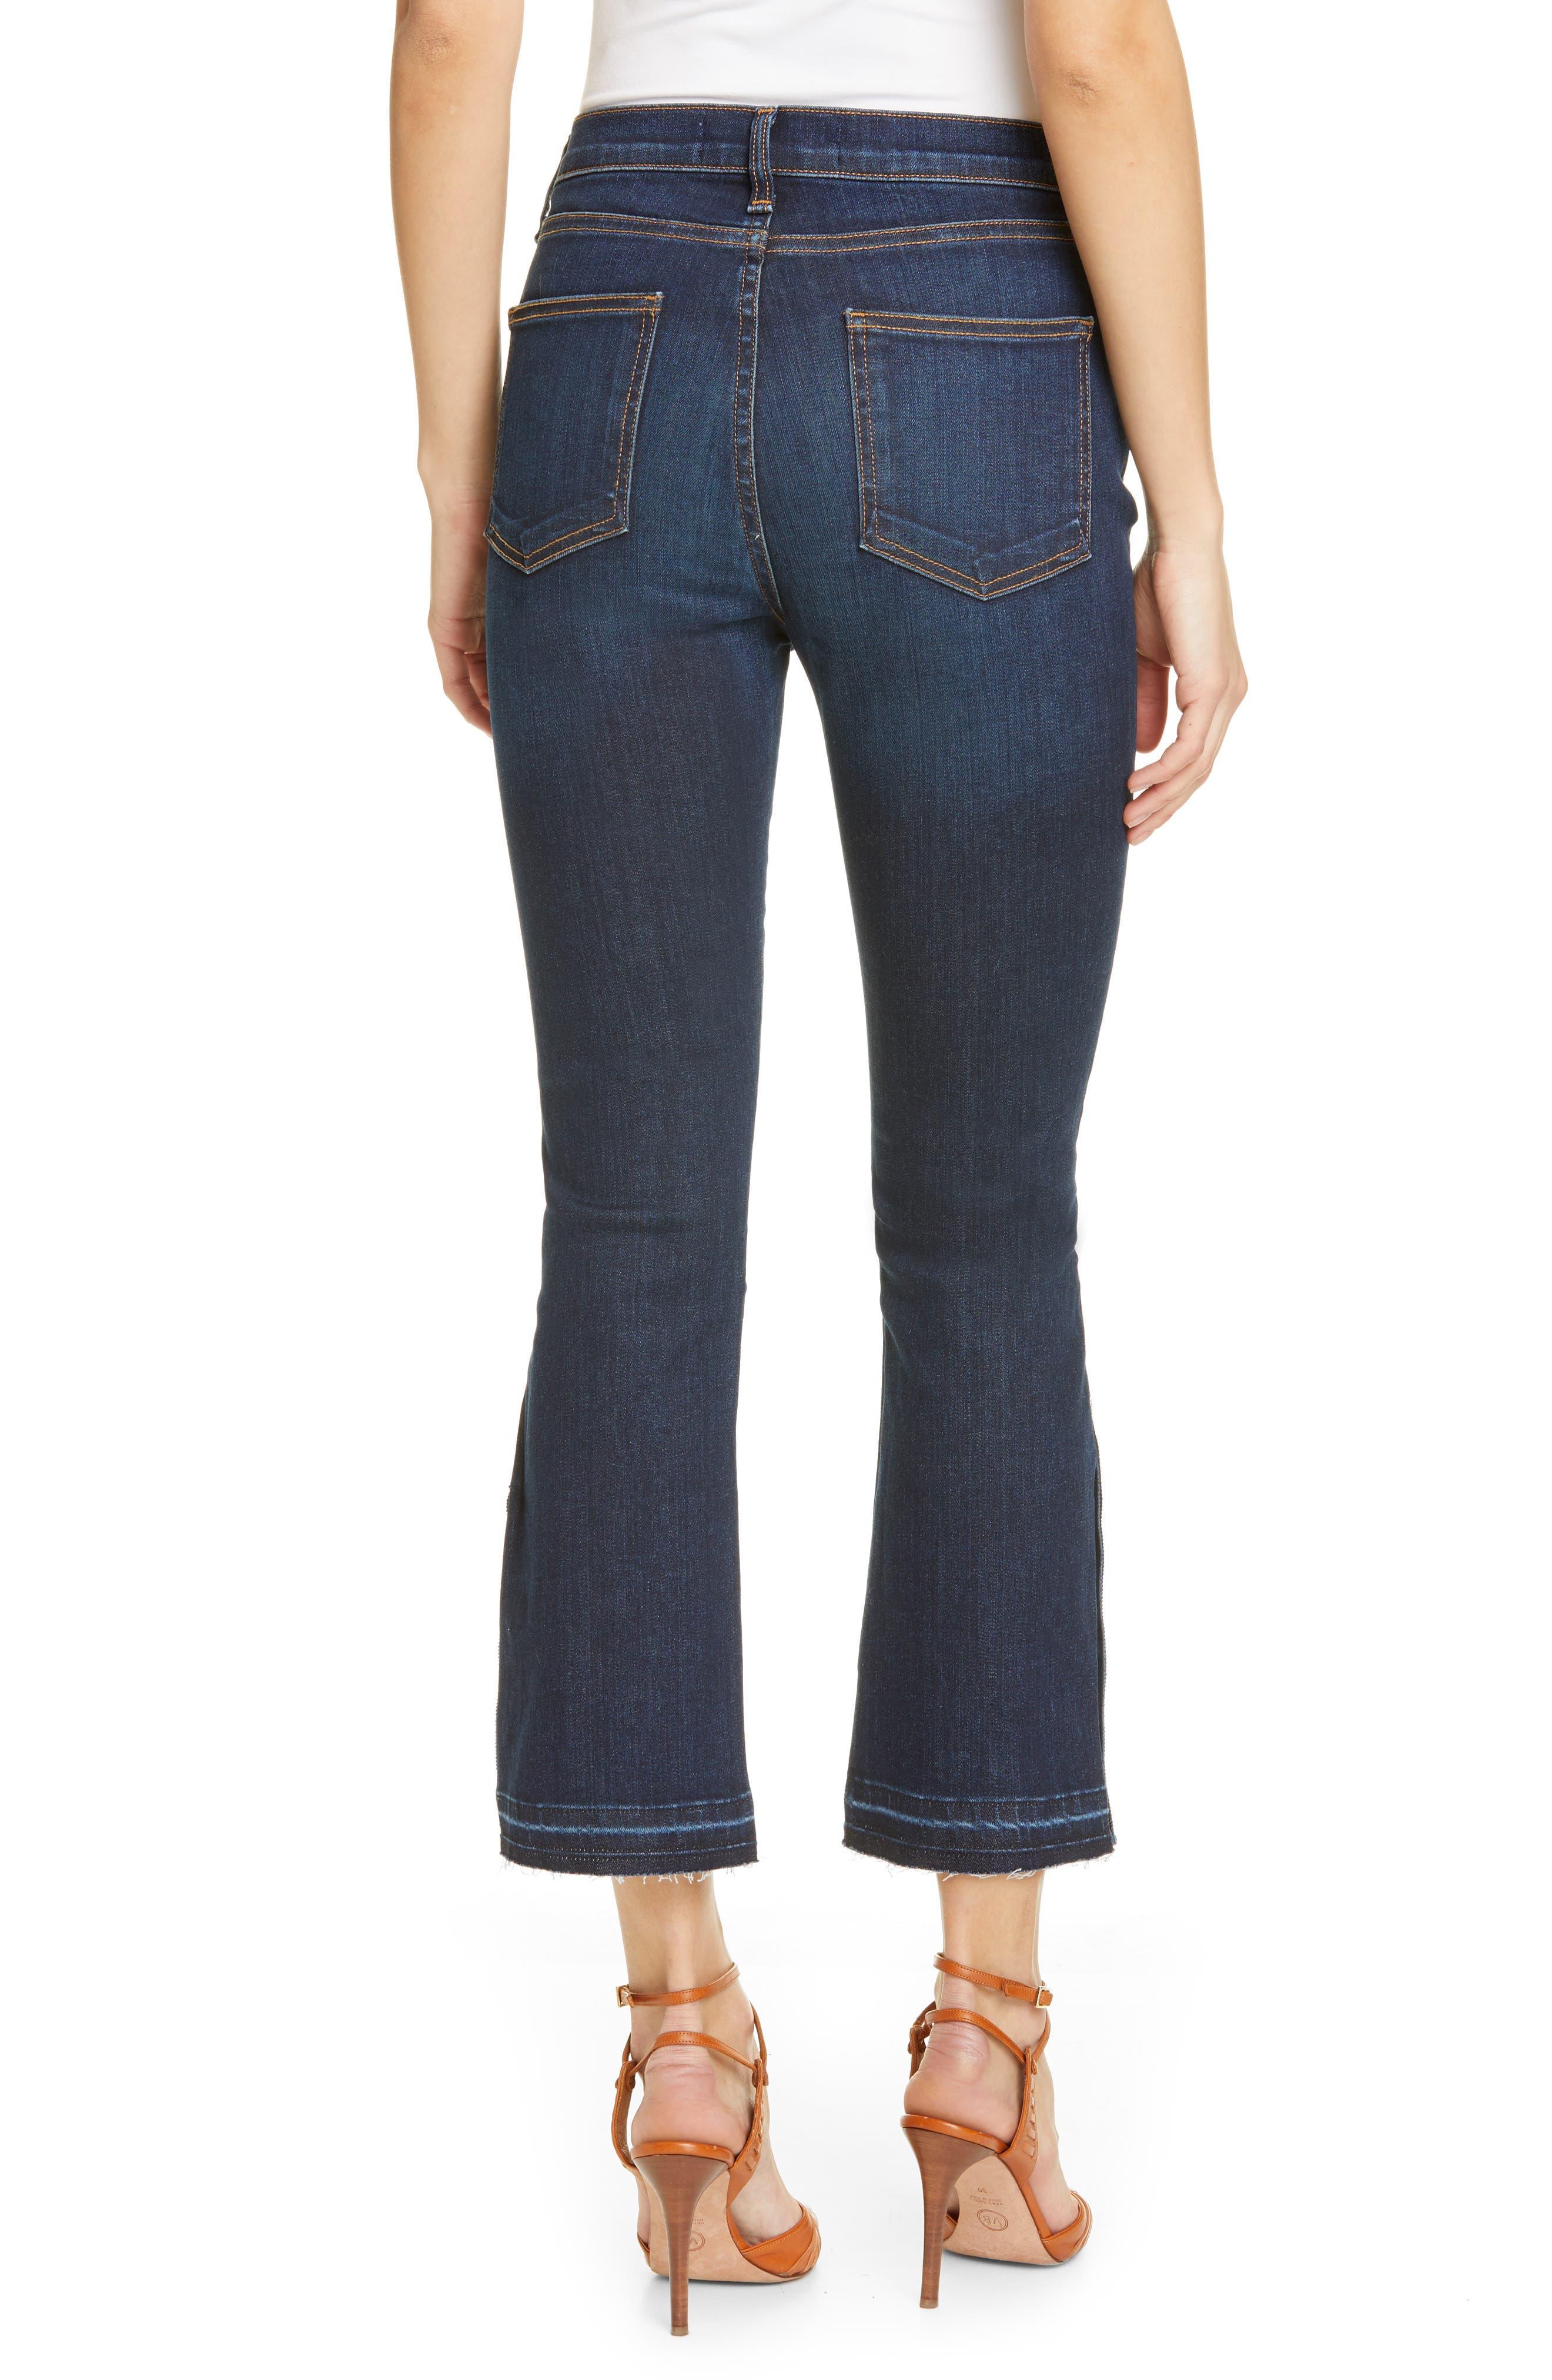 VERONICA BEARD, Carolyn Side Vent Baby Boot Jeans, Alternate thumbnail 2, color, DARK VINTAGE